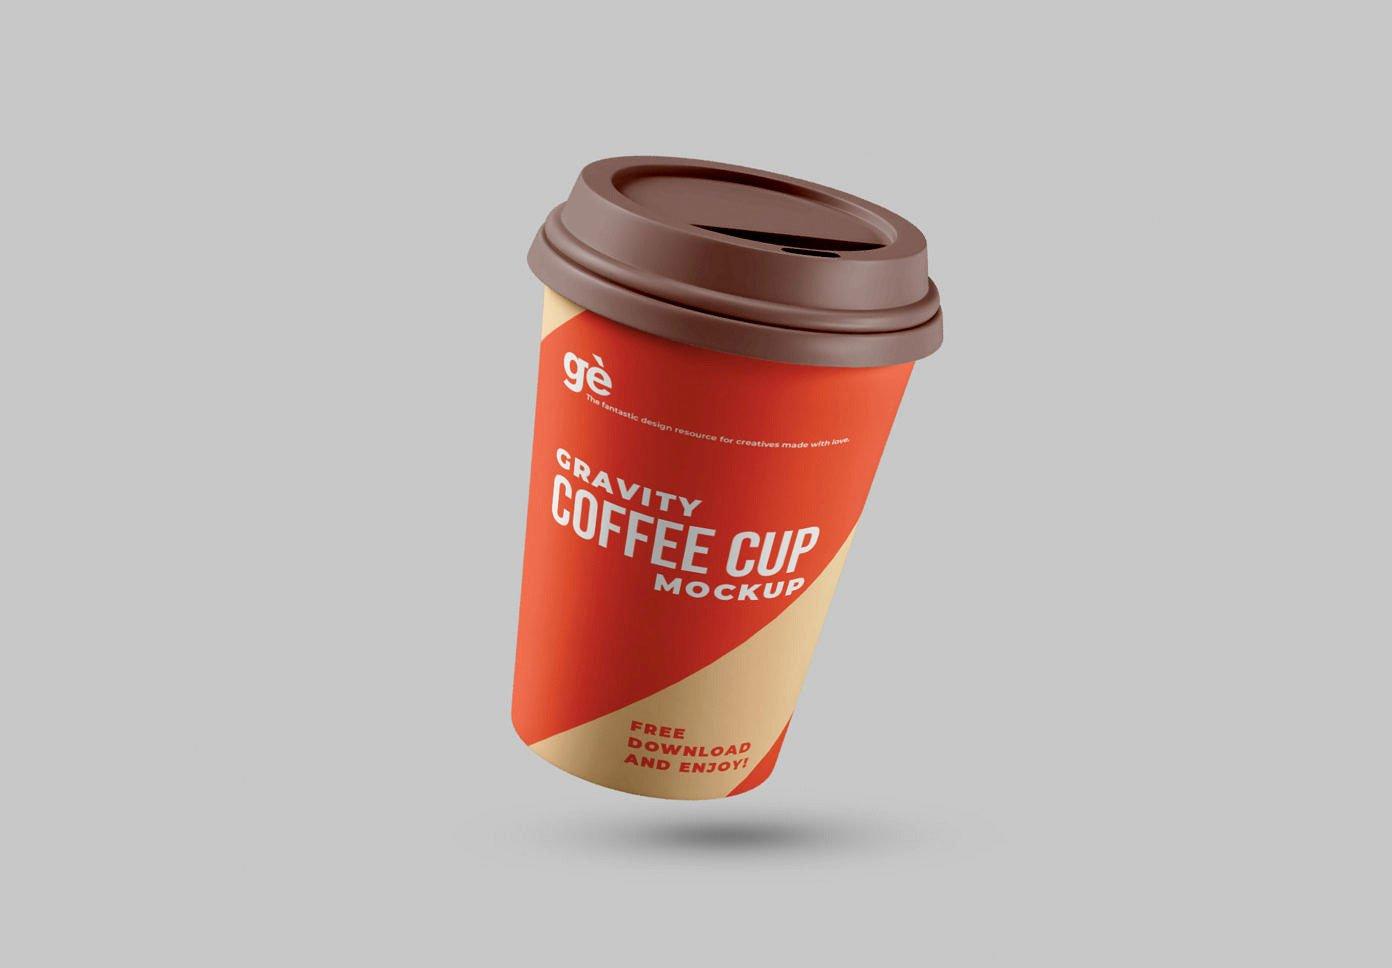 Free Gravity Coffee Cup Mockup